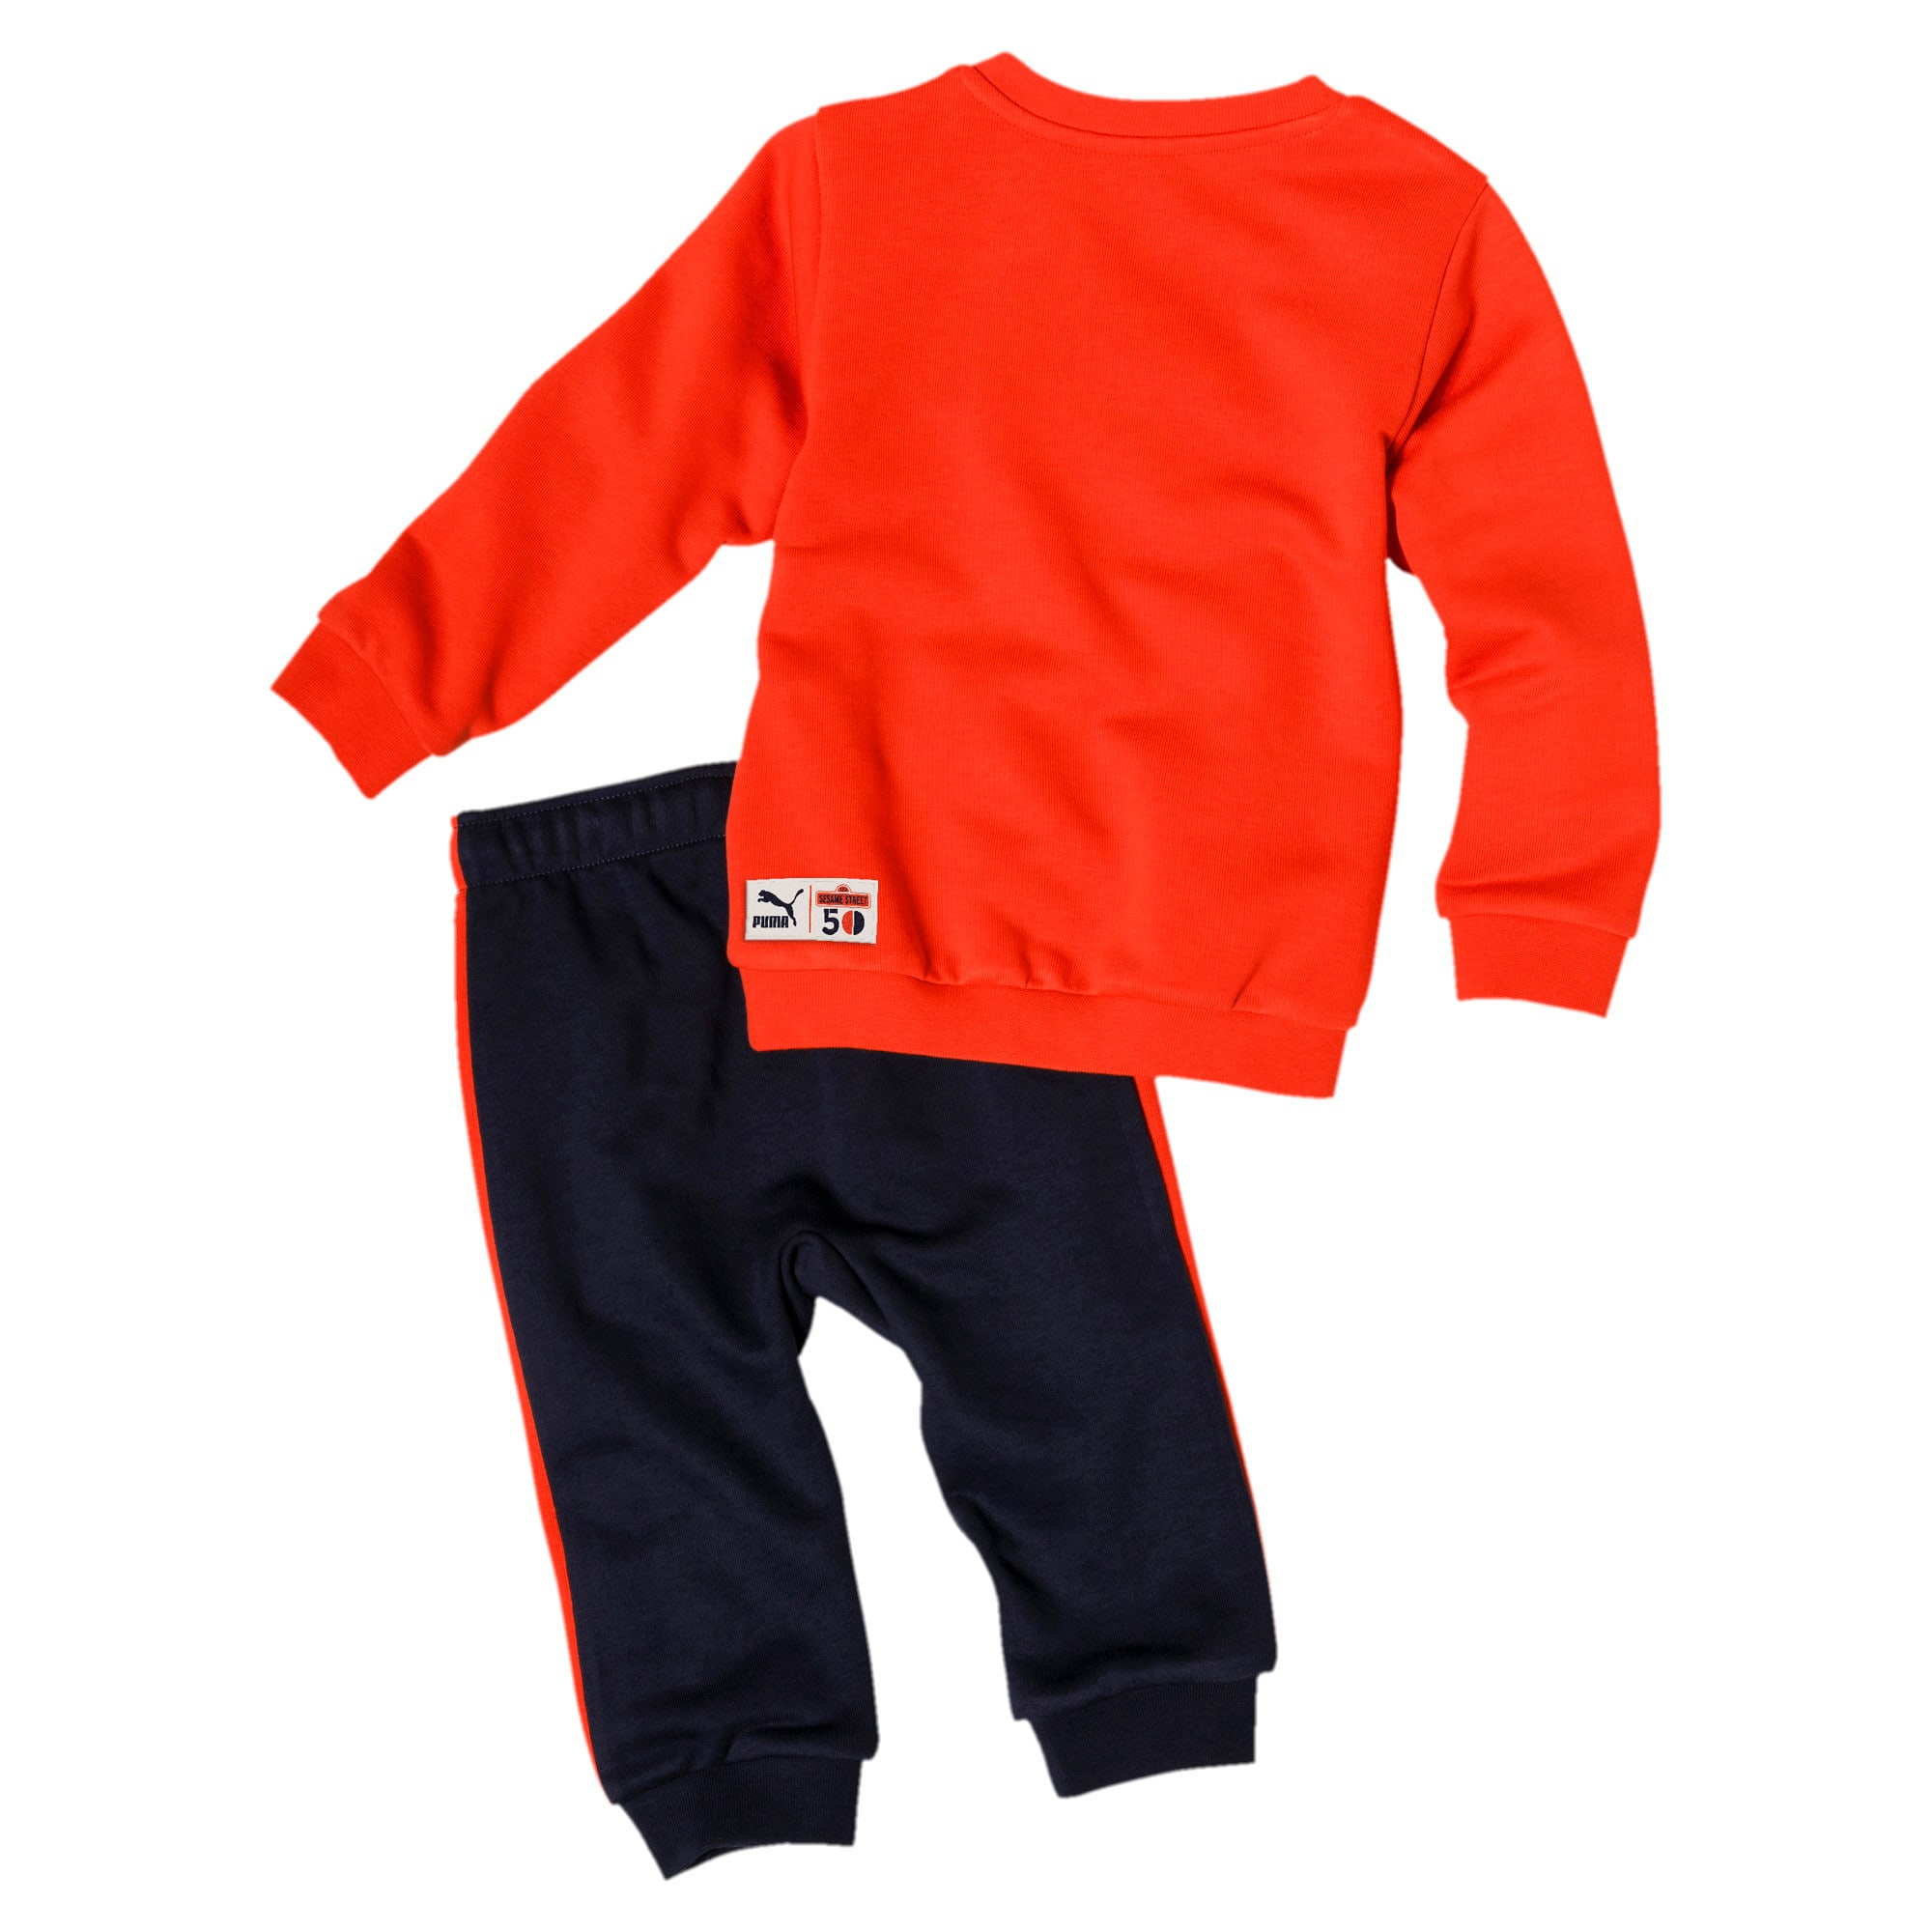 Thumbnail 2 of PUMA x SESAME STREET Infant + Toddler Crewneck Jogger Set, Cherry Tomato, medium